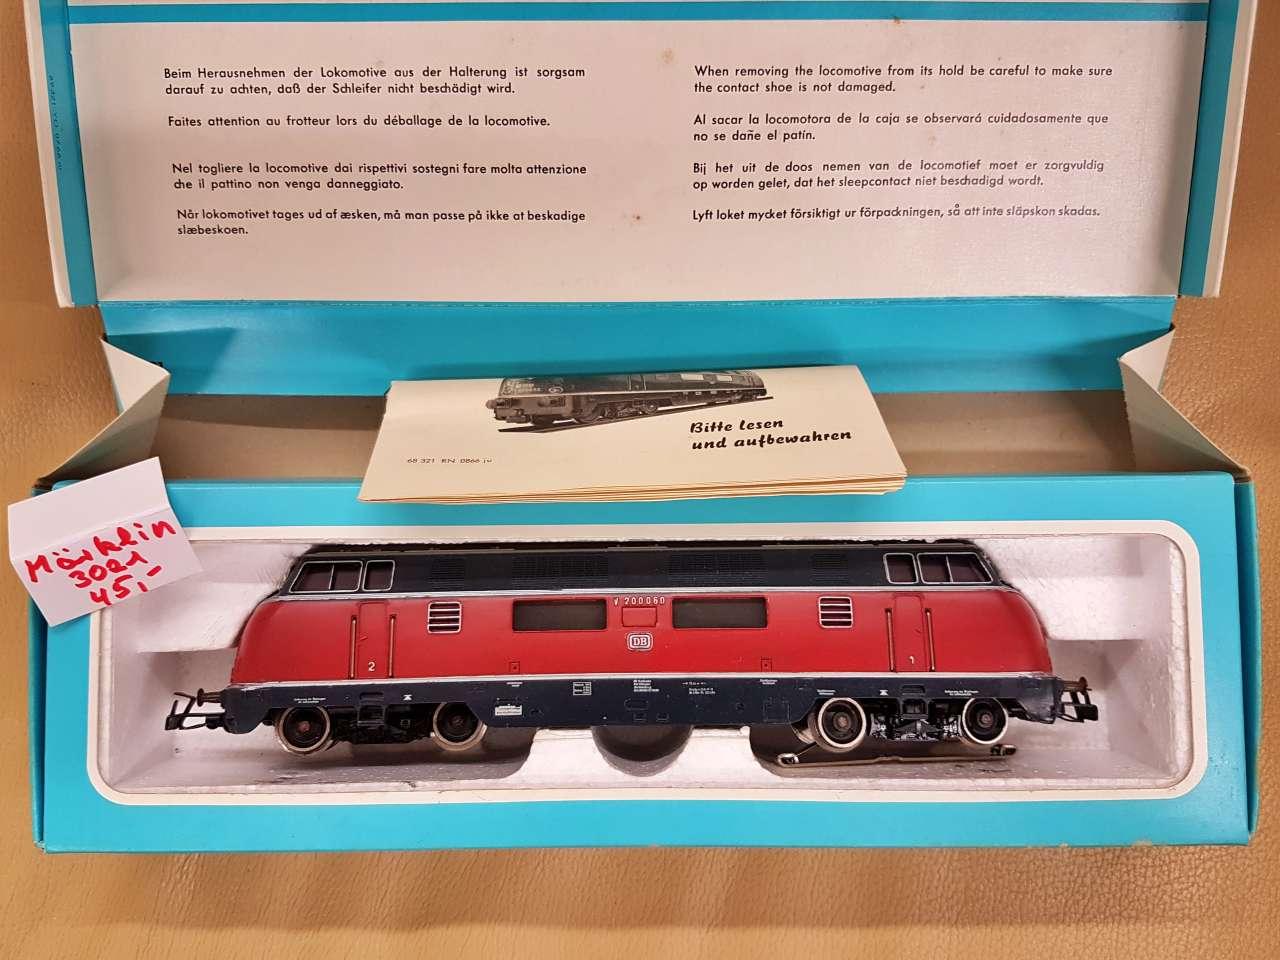 Märklin Modelleisenbahn Sammlerstücke neuwertig Lok 3021